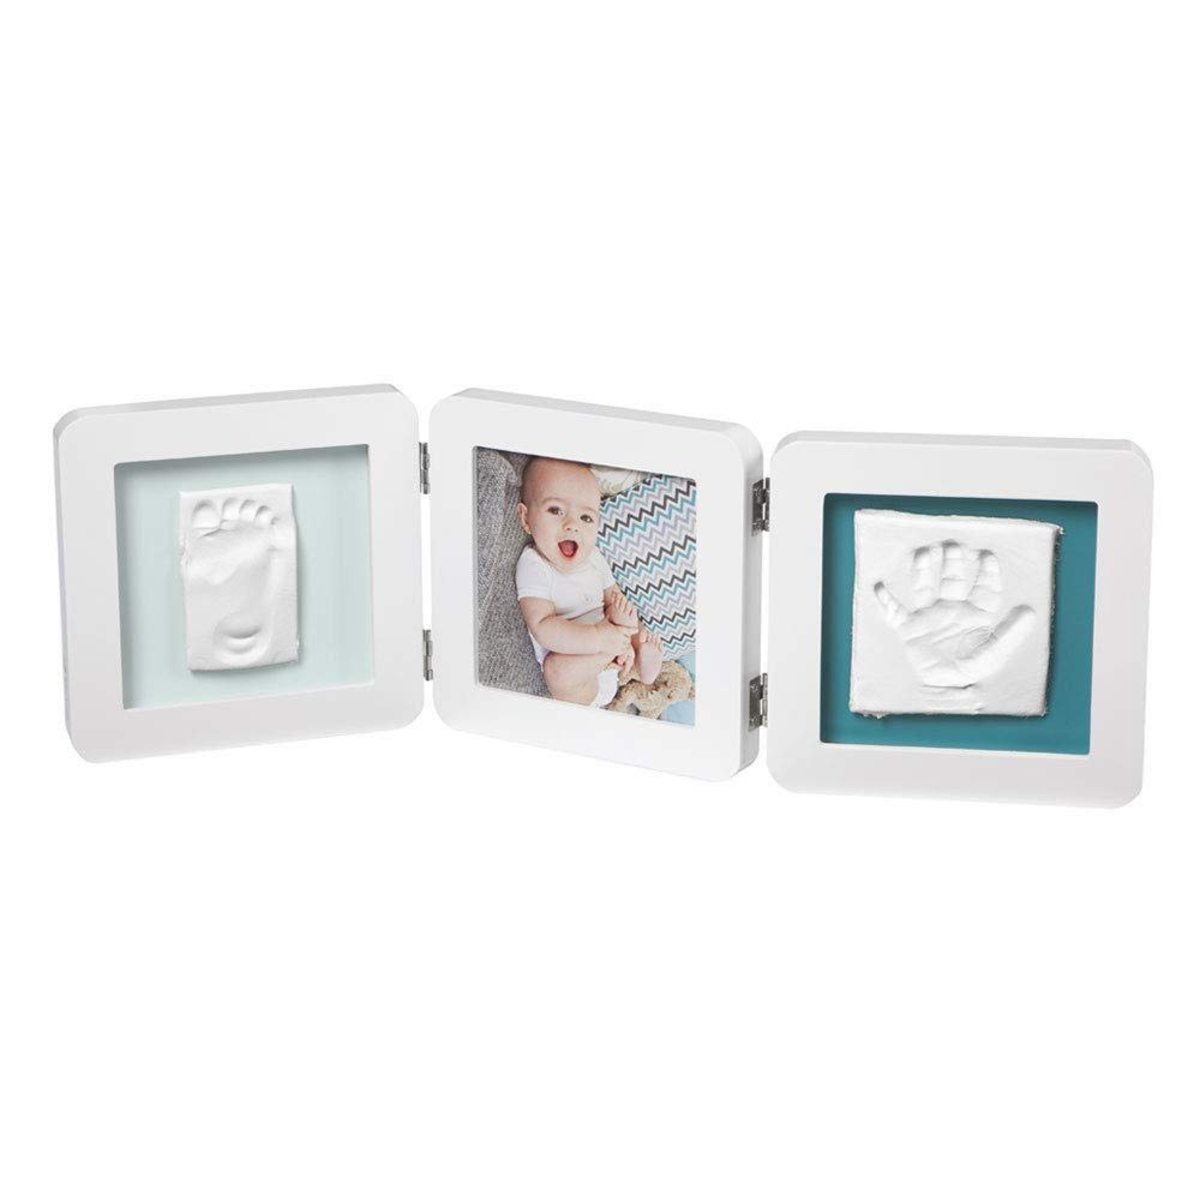 Empreinte & Moulage Kit d'Empreinte My Baby Touch Double - Blanc Kit d'Empreinte My Baby Touch Double - Blanc